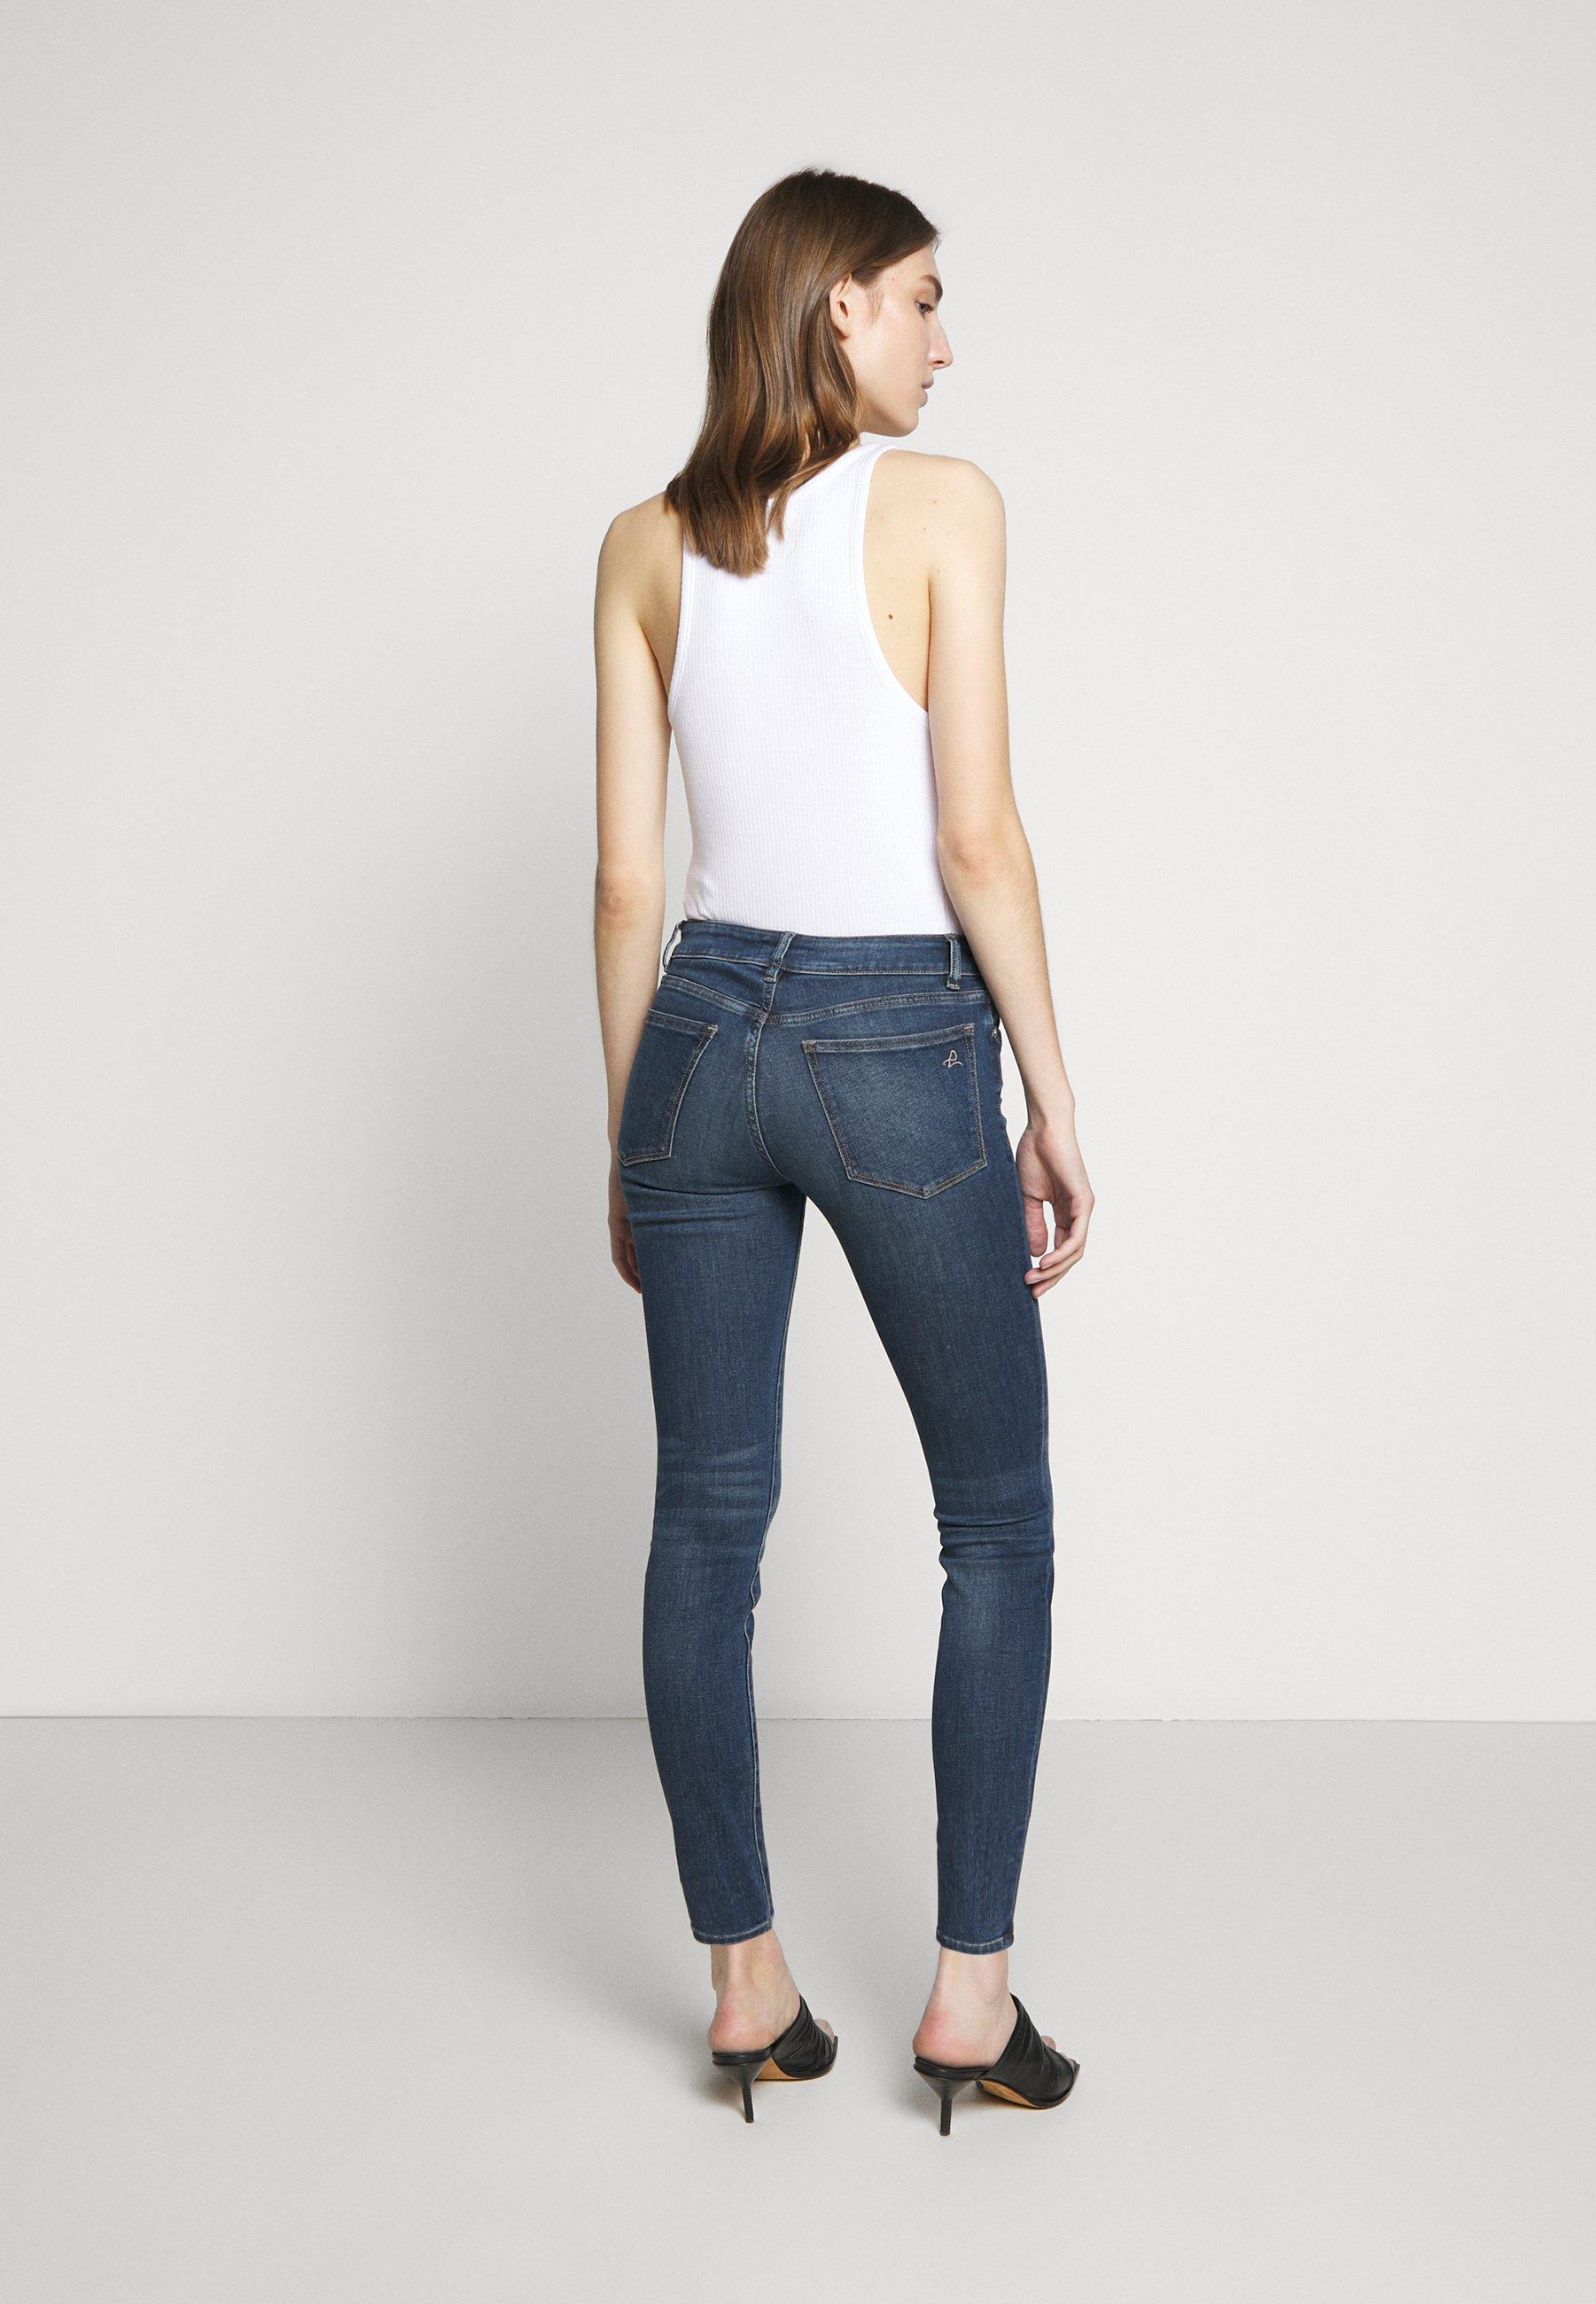 DL1961 EMMA  - Jeans Skinny - blair - Jeans Femme s6lly